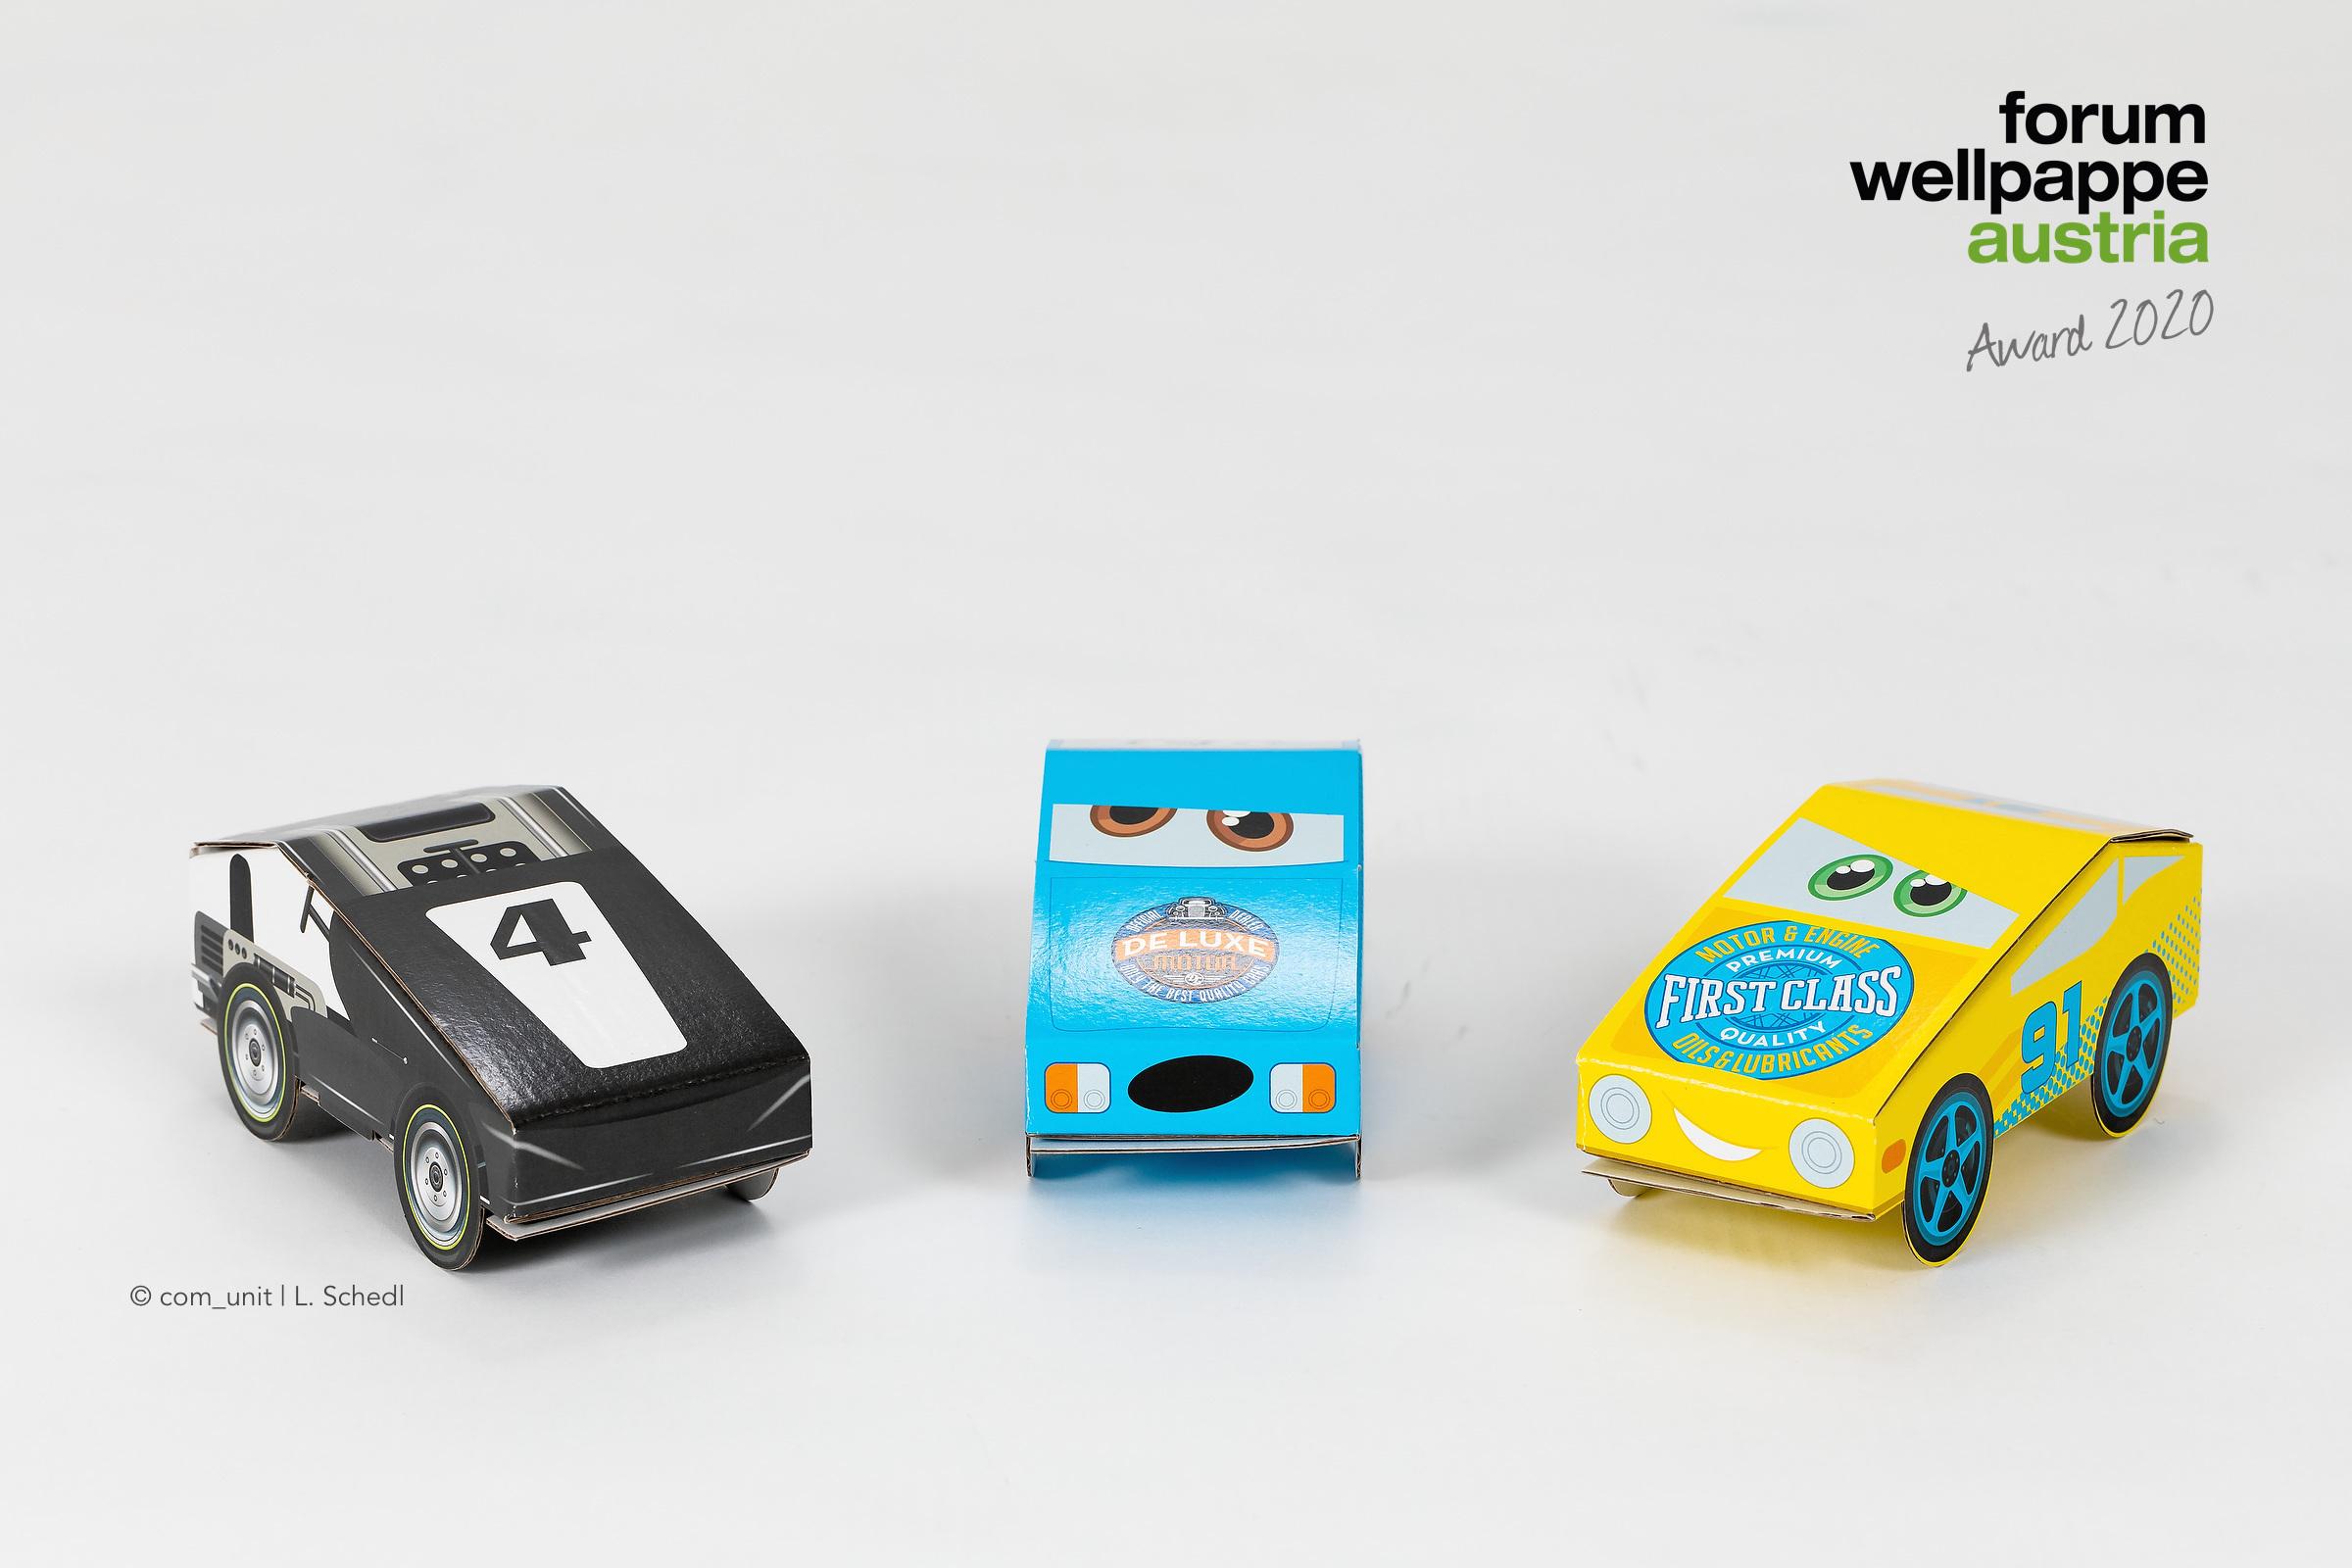 waa2020-racingcar-gewinner-nachwuchs-mondi-c-comunit-l.schedl